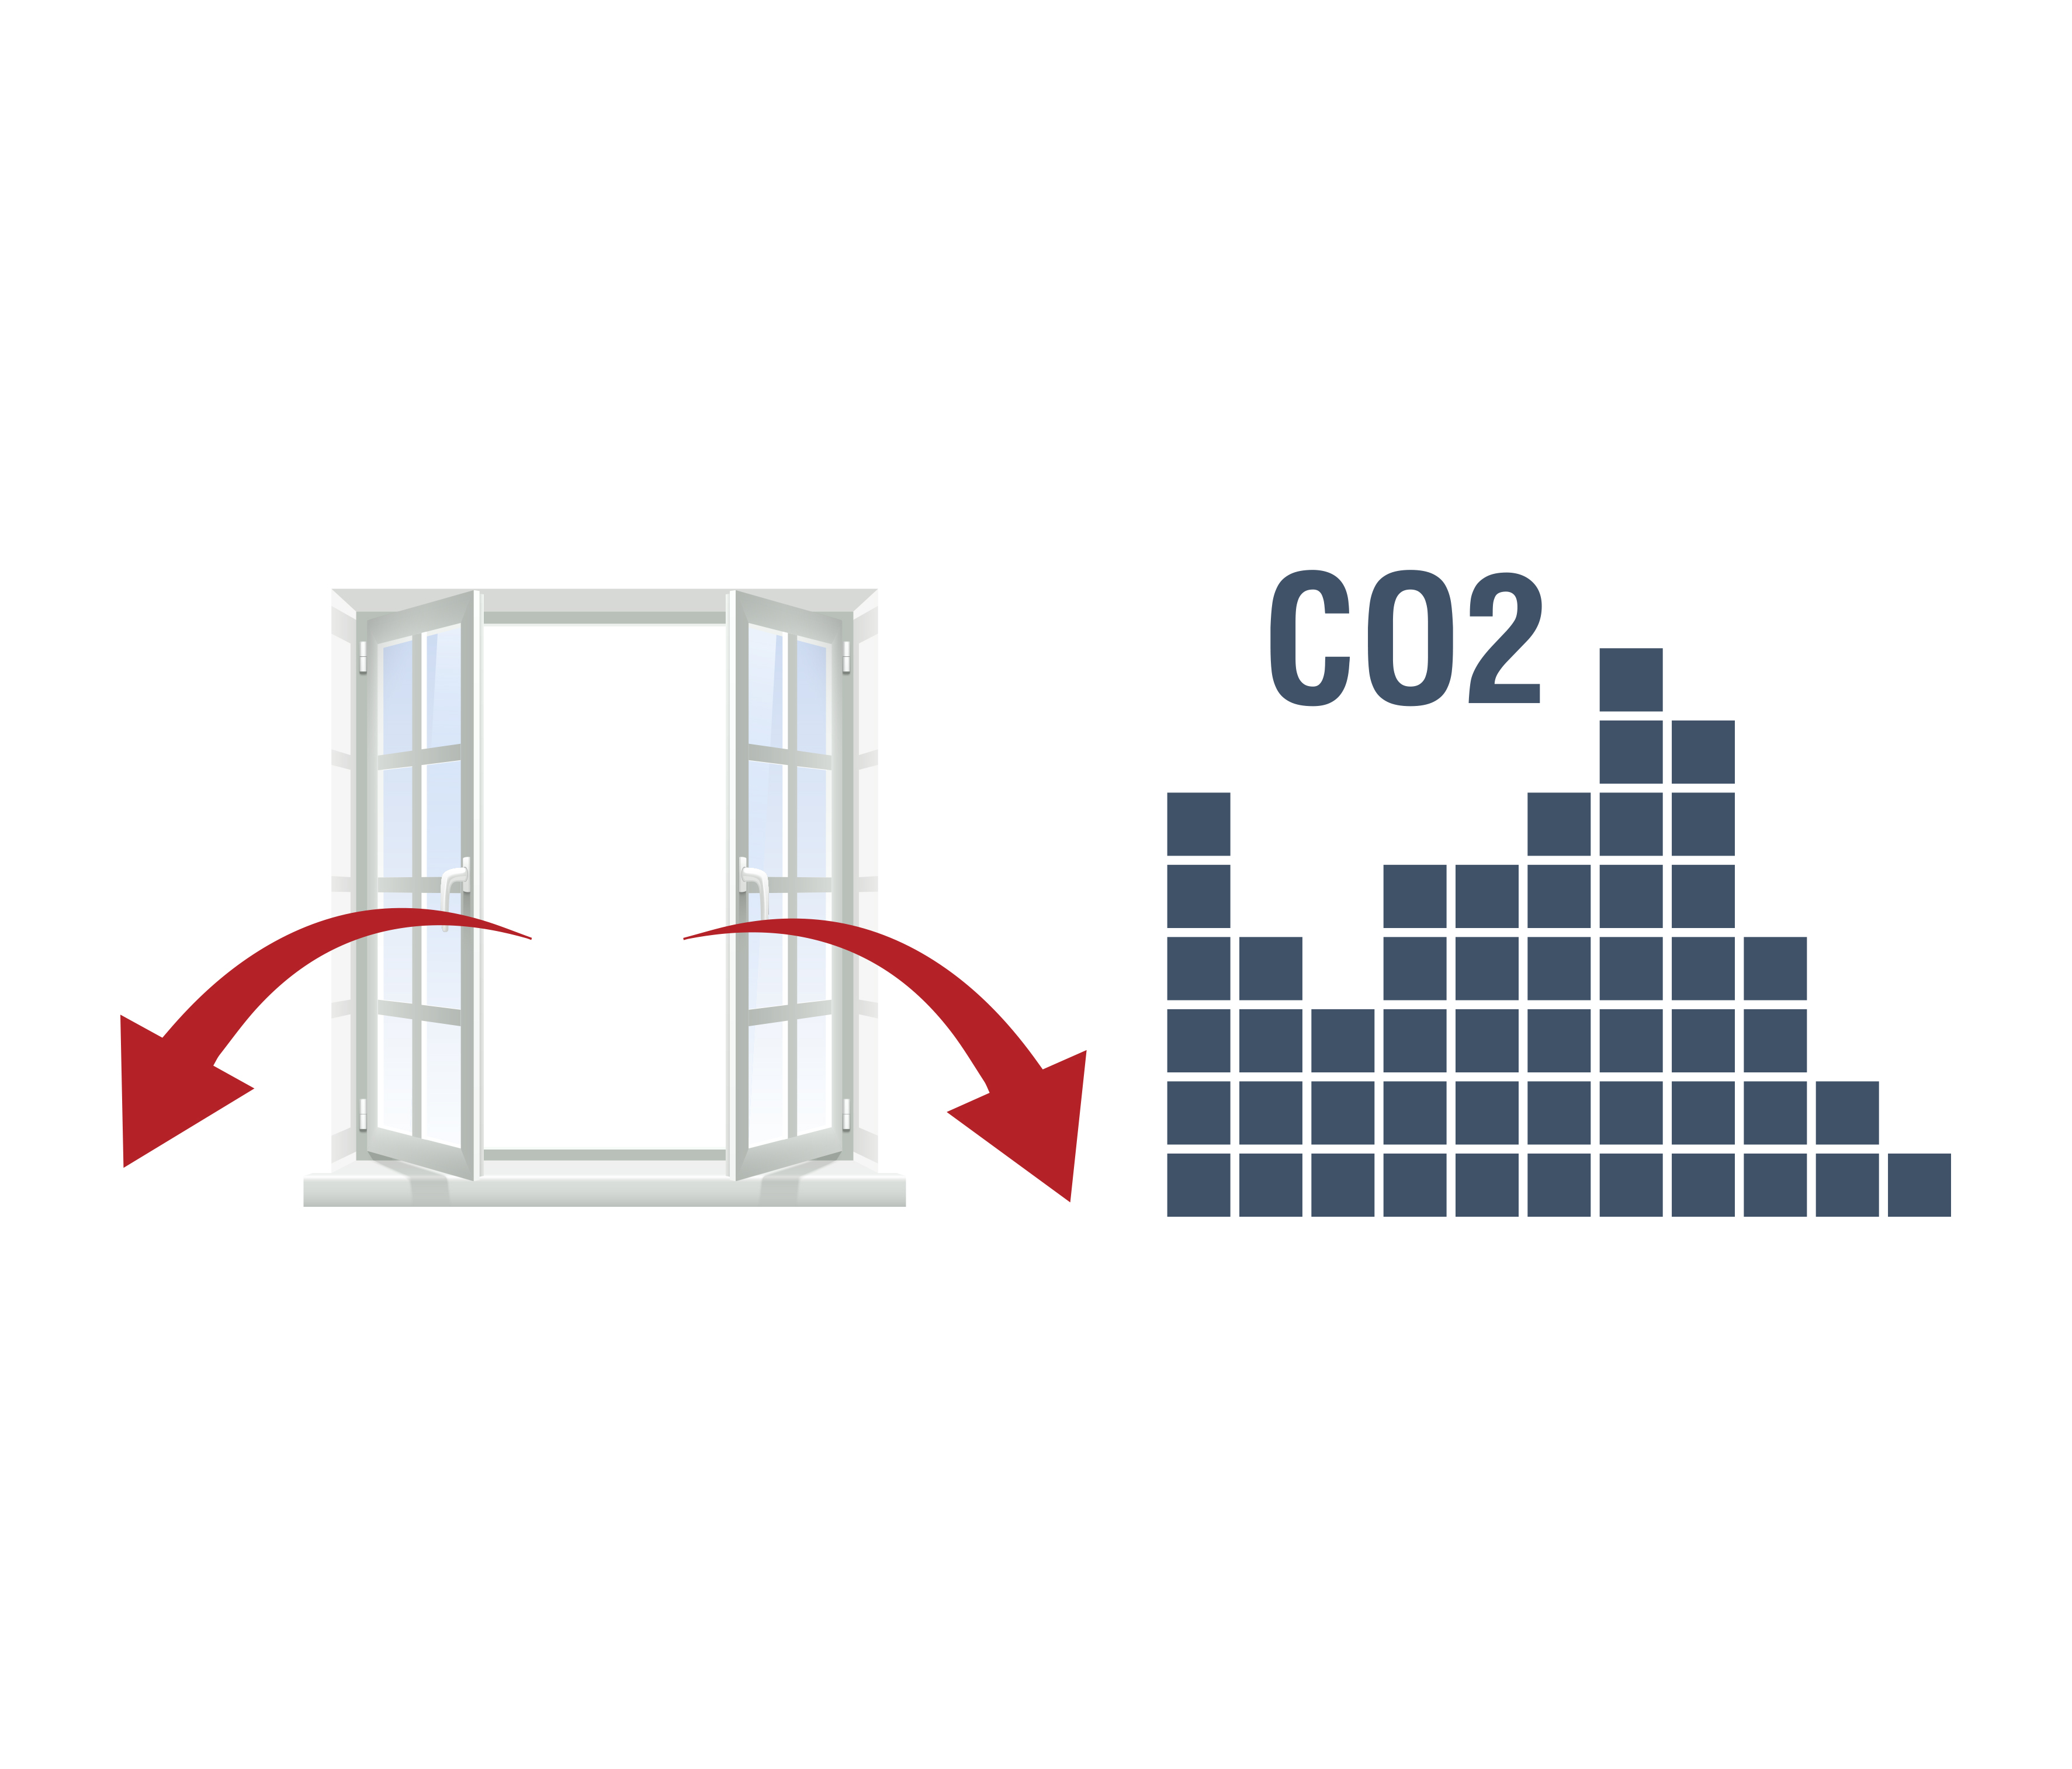 medidor de dioxido de carbono